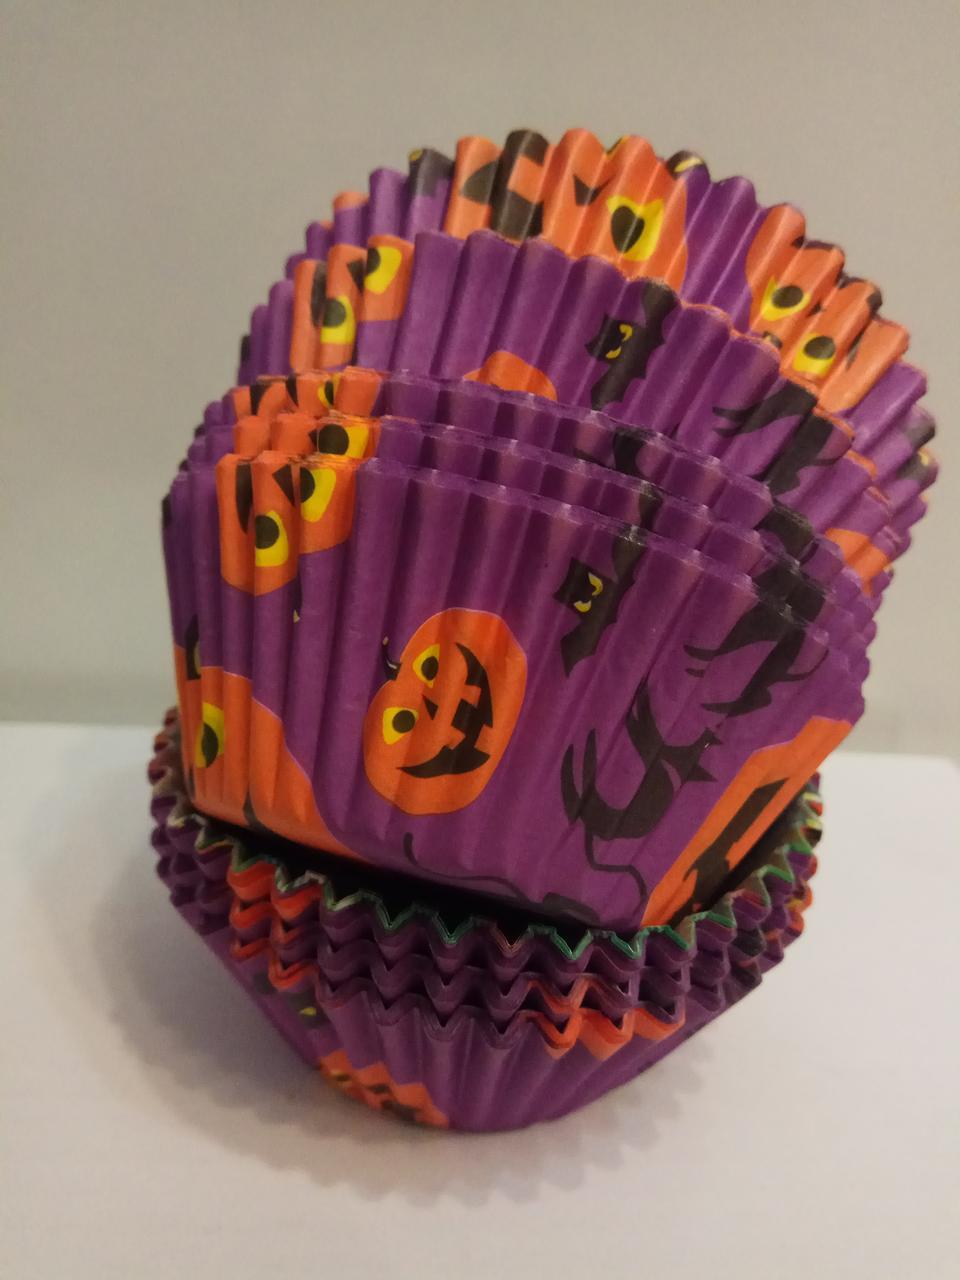 Форма бумажная для кексов Хэллоуин 100 шт.